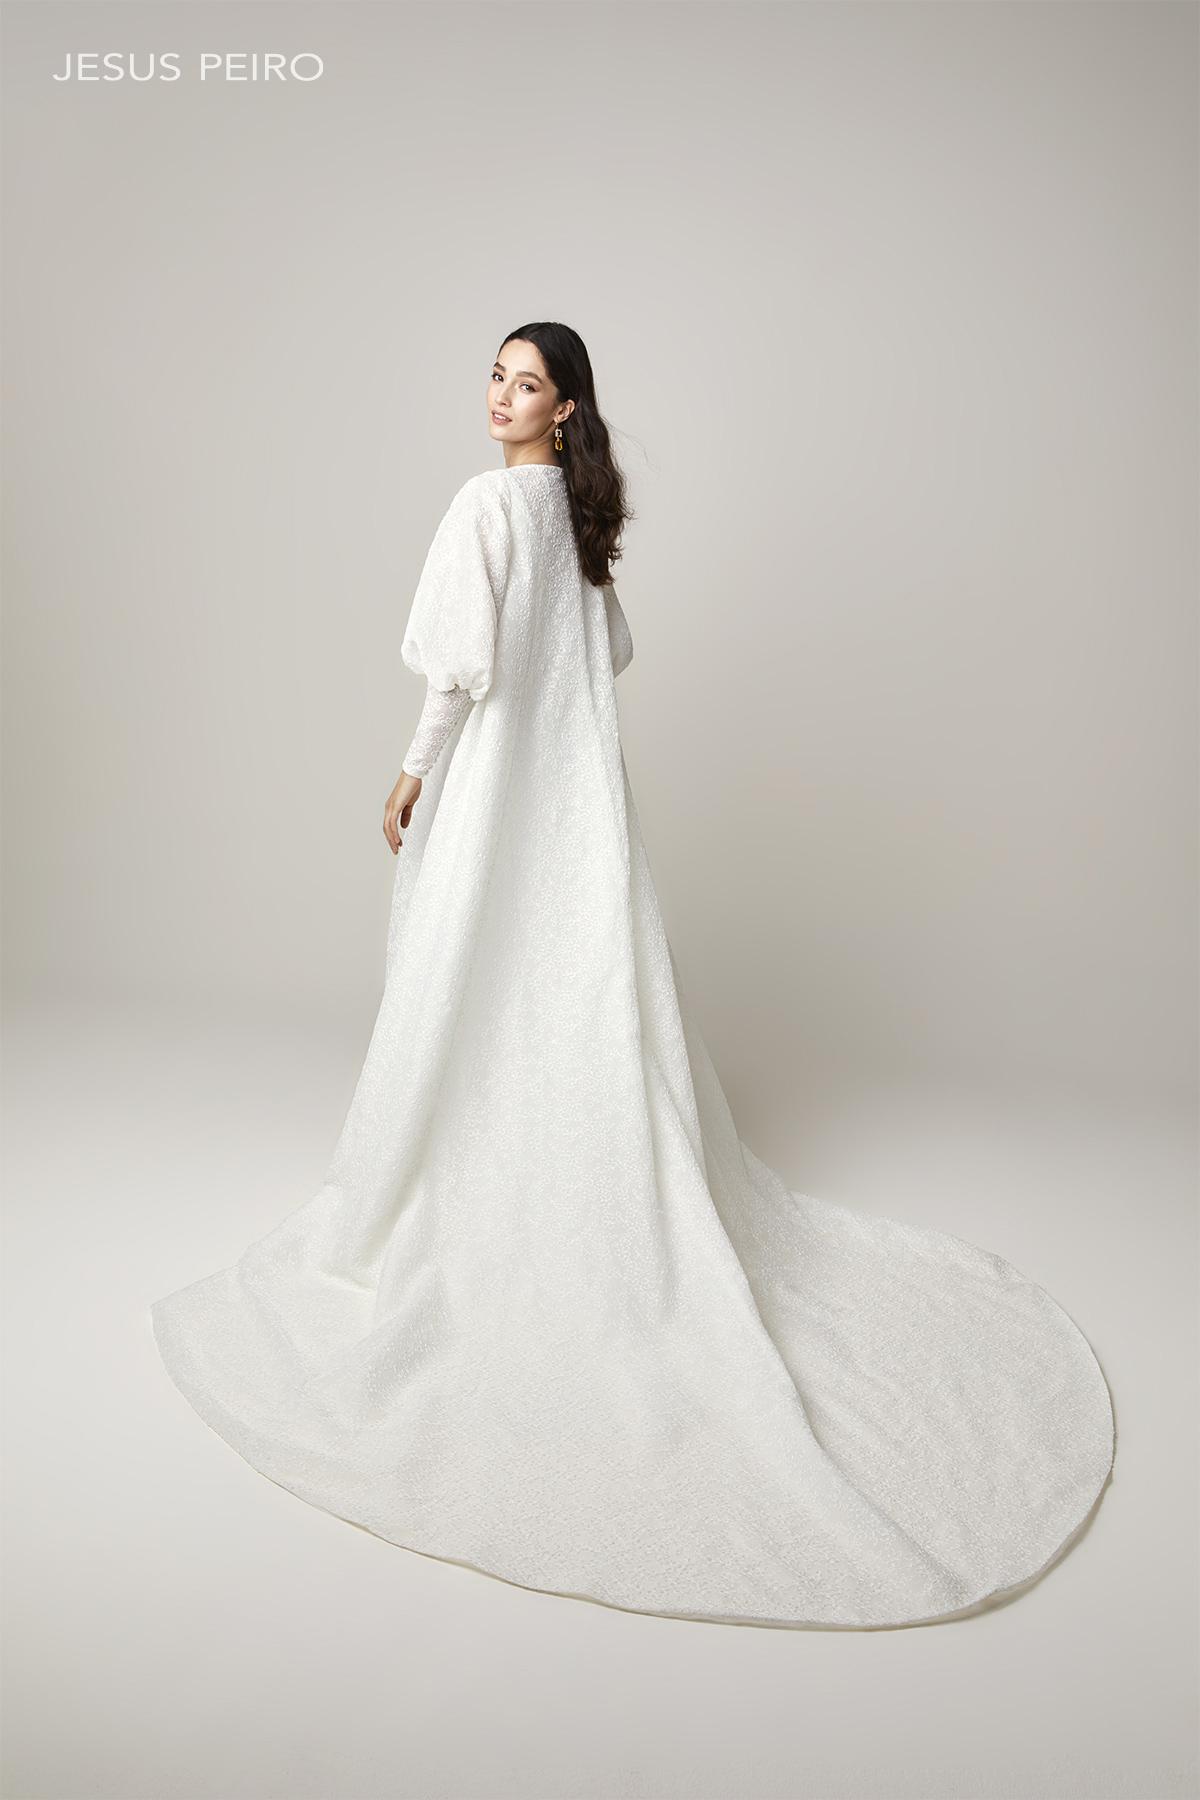 Vestido novia Jesús Peiró Ref.2232